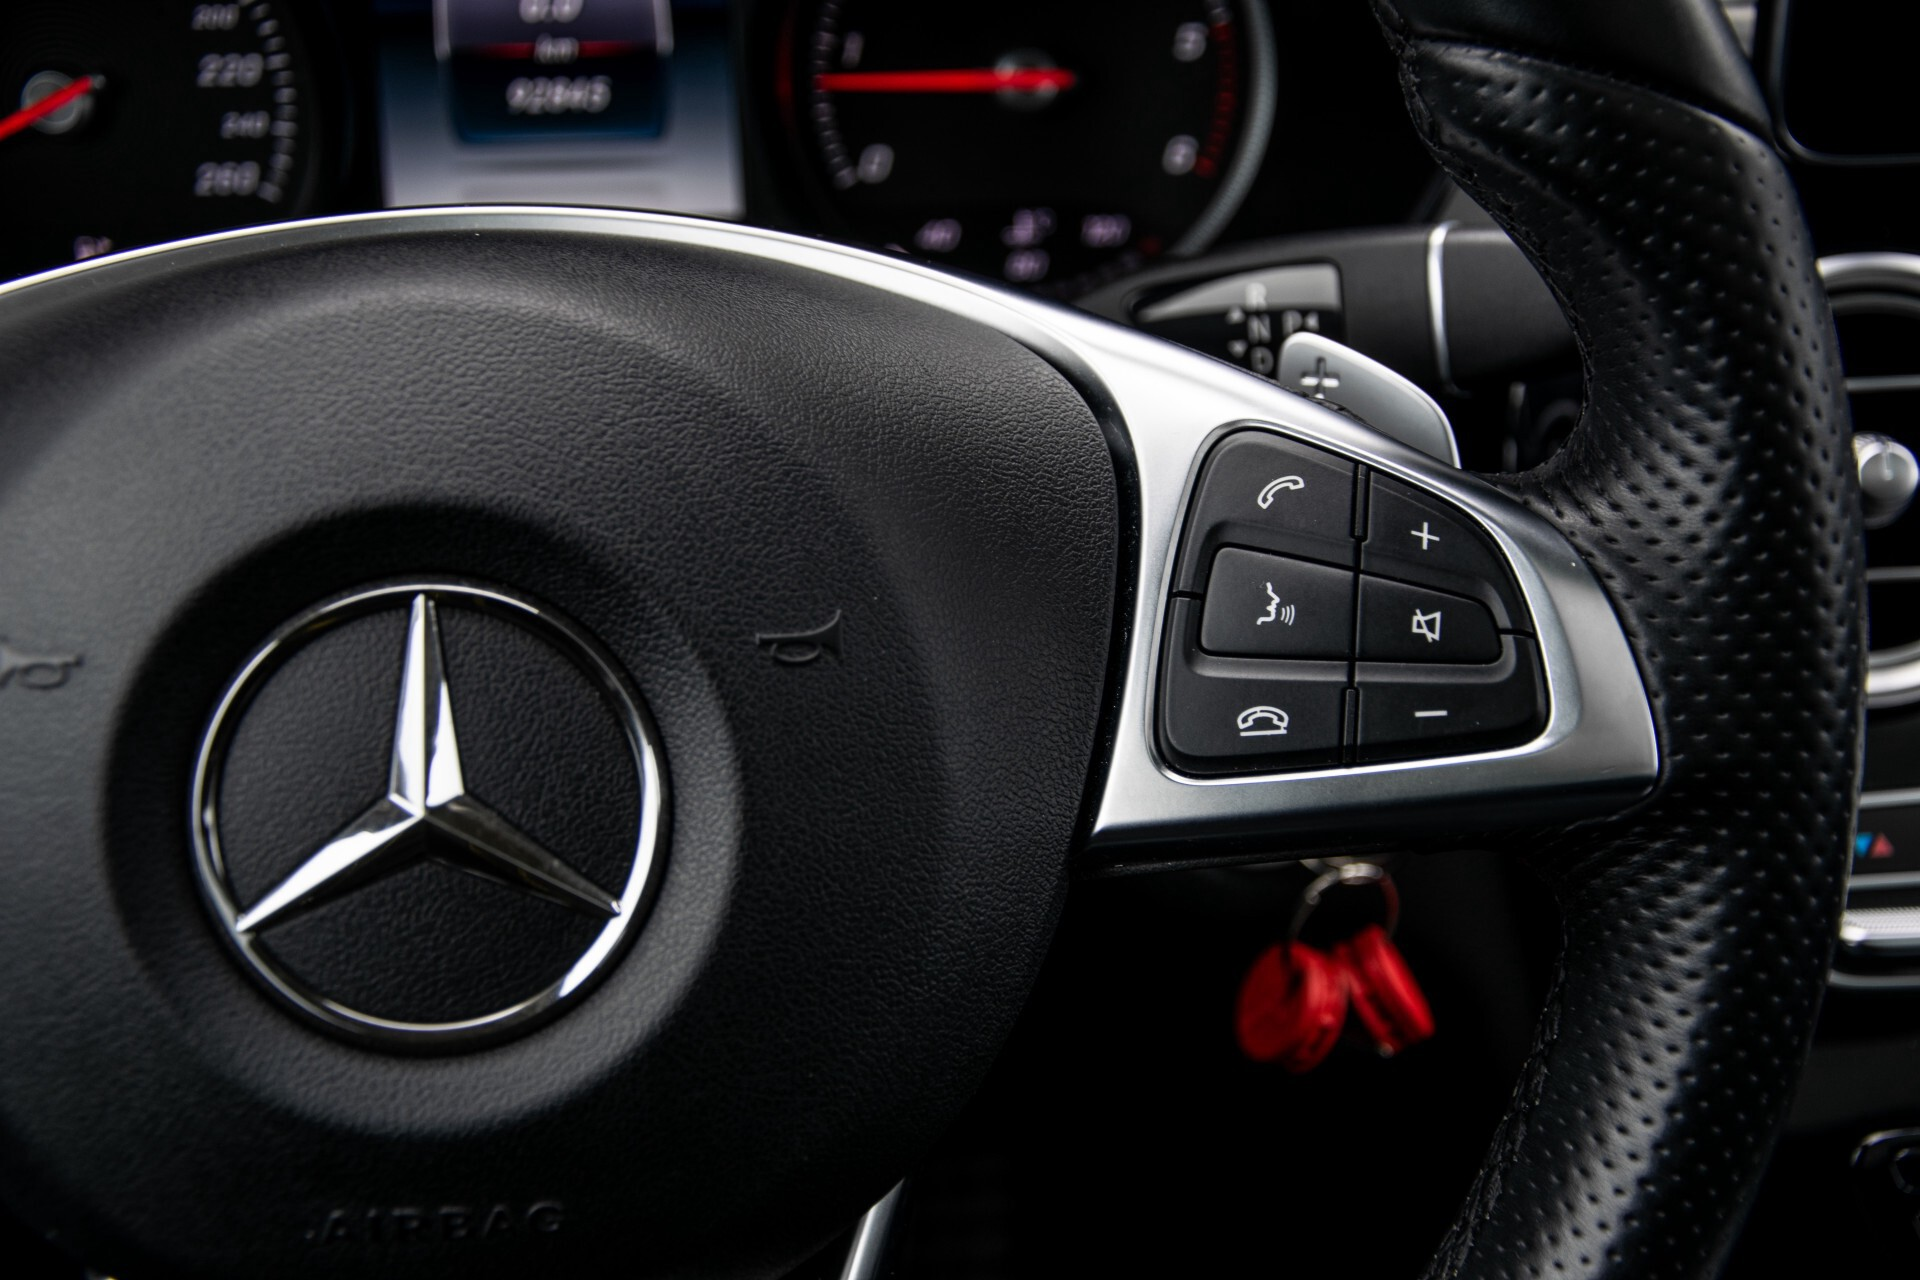 Mercedes-Benz GLC 220 d 4-M AMG/Distronic/Panorama/Comand/HUD/Afn-Trhk Aut9 Foto 15